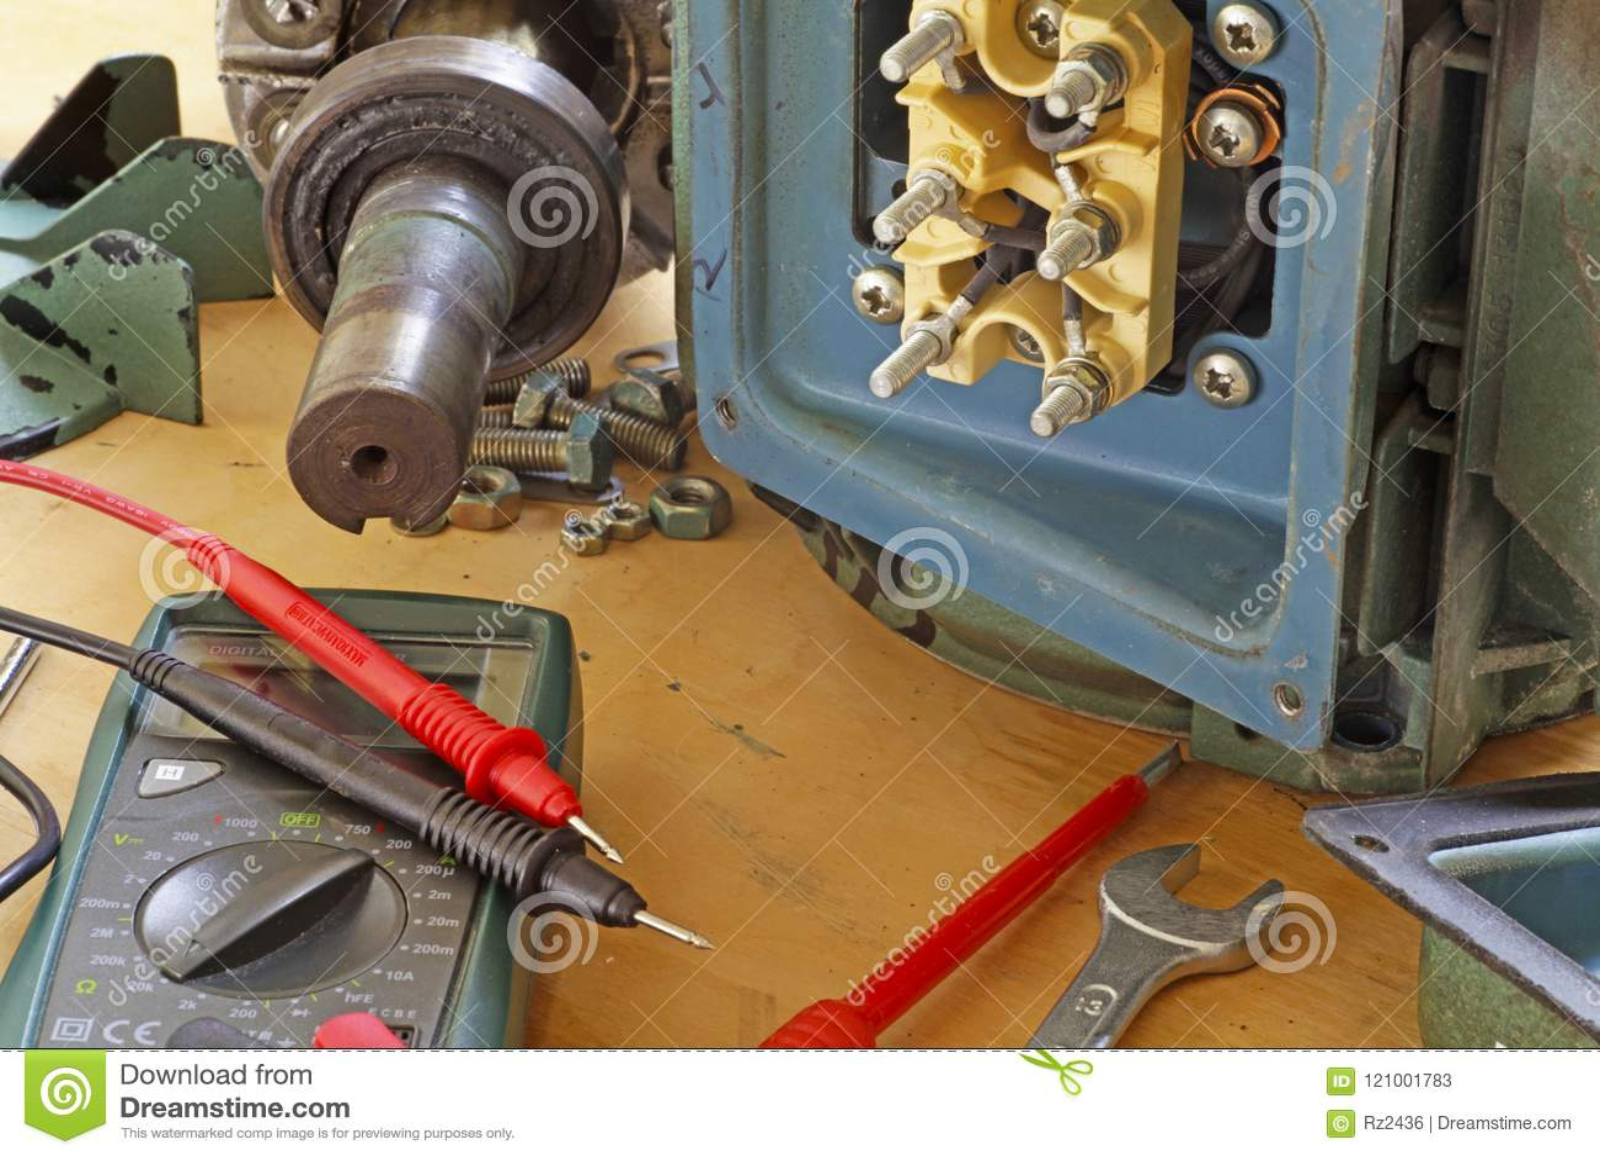 Three Phase Induction Motor Bearing Repair Stock Image - Image of ...